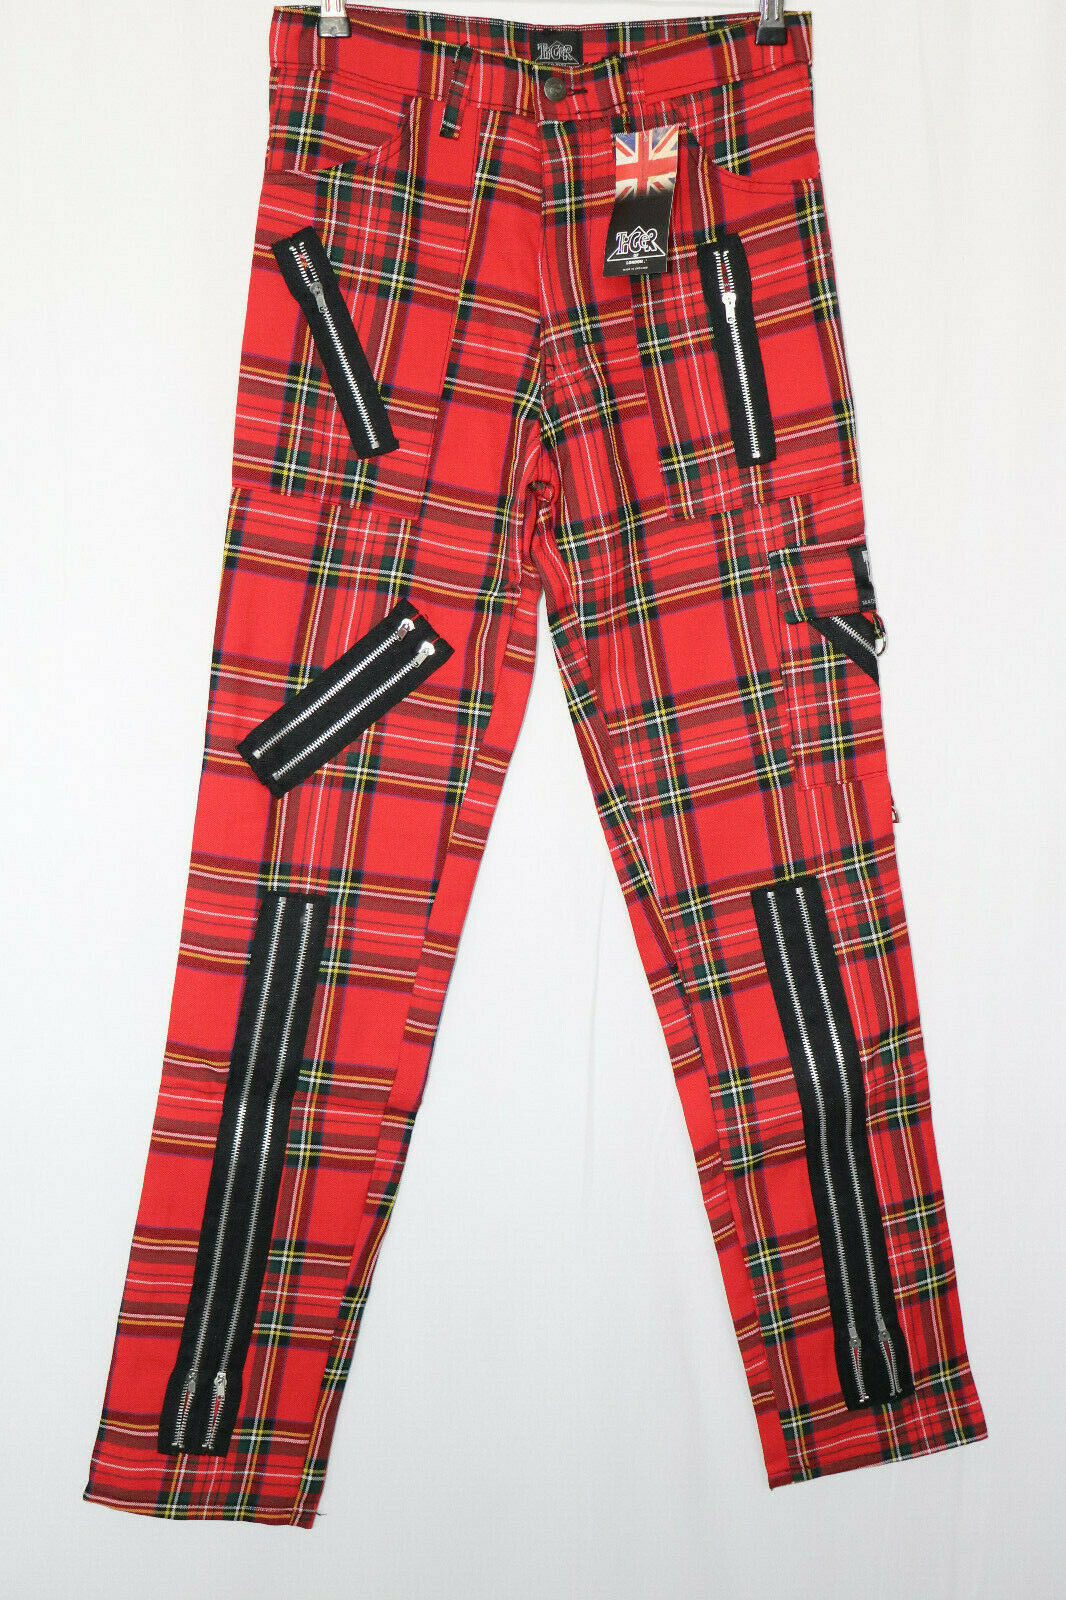 Tiger London Zipper Kariert Caro punk Ghotic Hose jeans 30 inch rot freaks